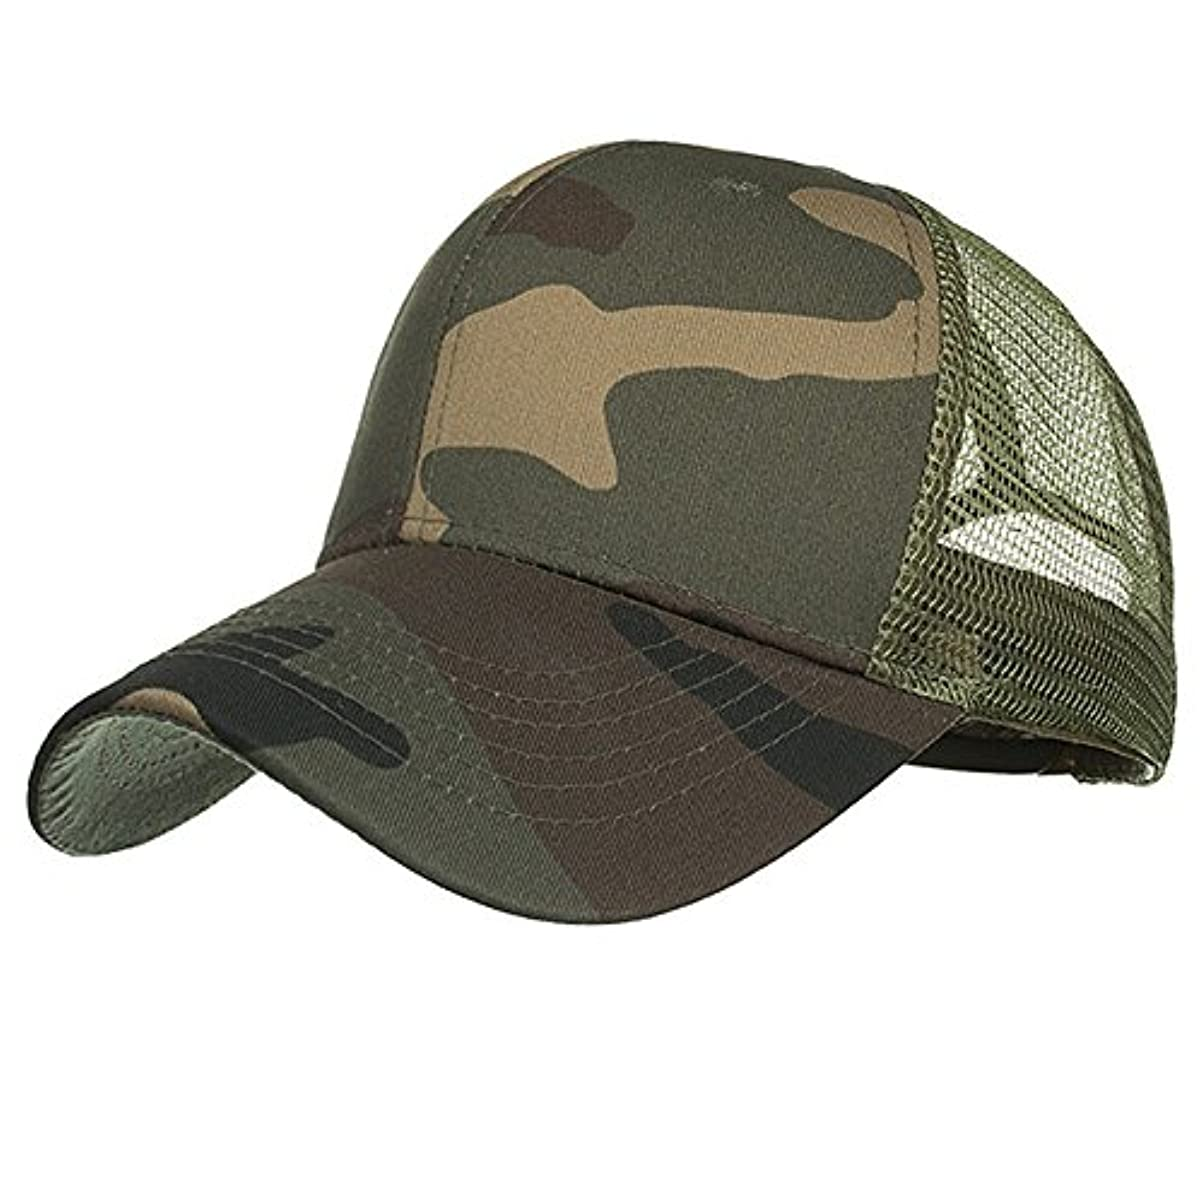 貧困生産的恒久的Racazing Cap 迷彩 野球帽 メッシュステッチ 通気性のある 帽子 夏 登山 可調整可能 刺繍 棒球帽 UV 帽子 軽量 屋外 Unisex Hat (A)